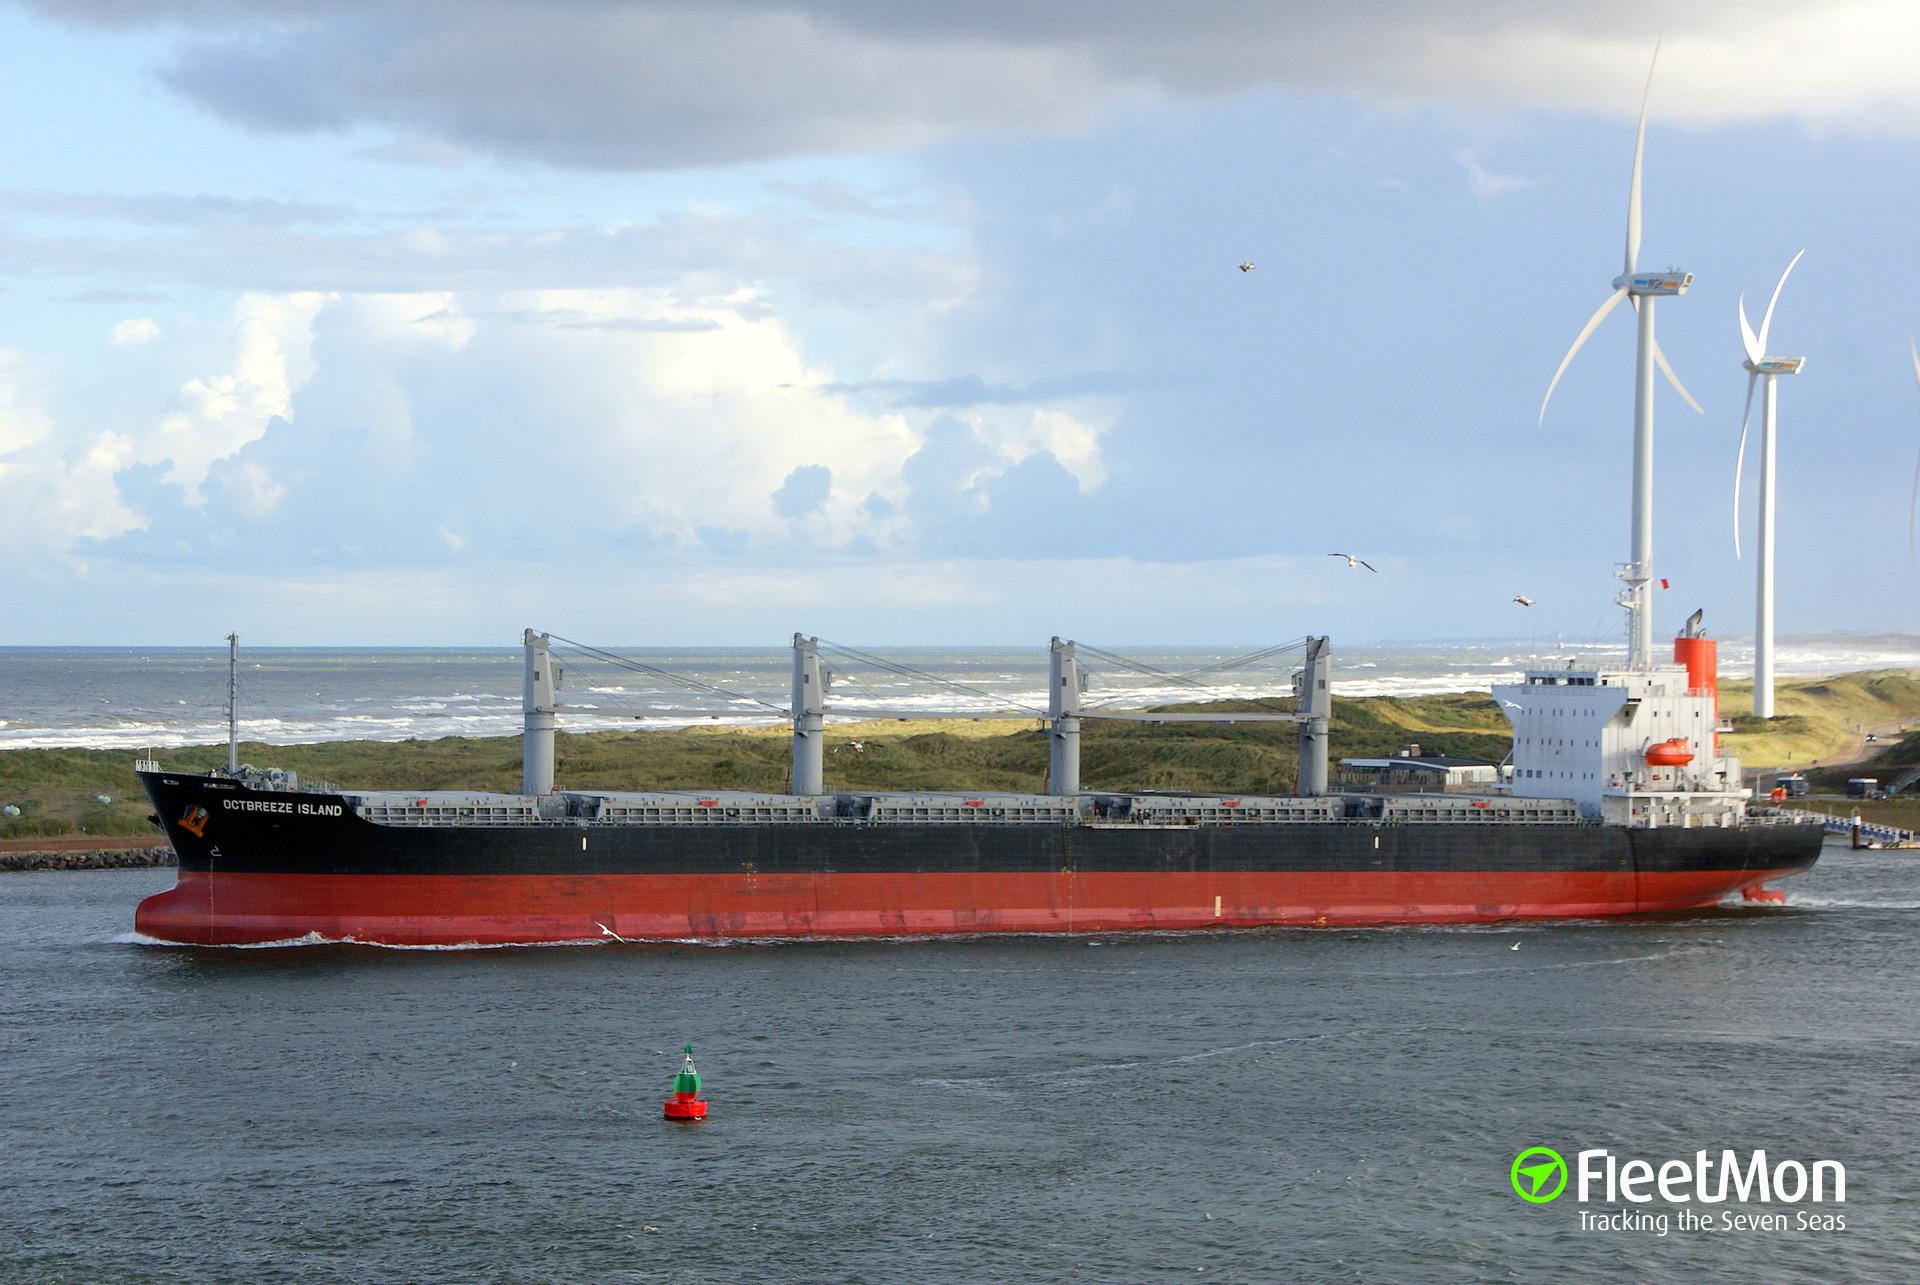 Bulk carrier Octbreeze Island vs. product tanker Ghetty Bottiglieri